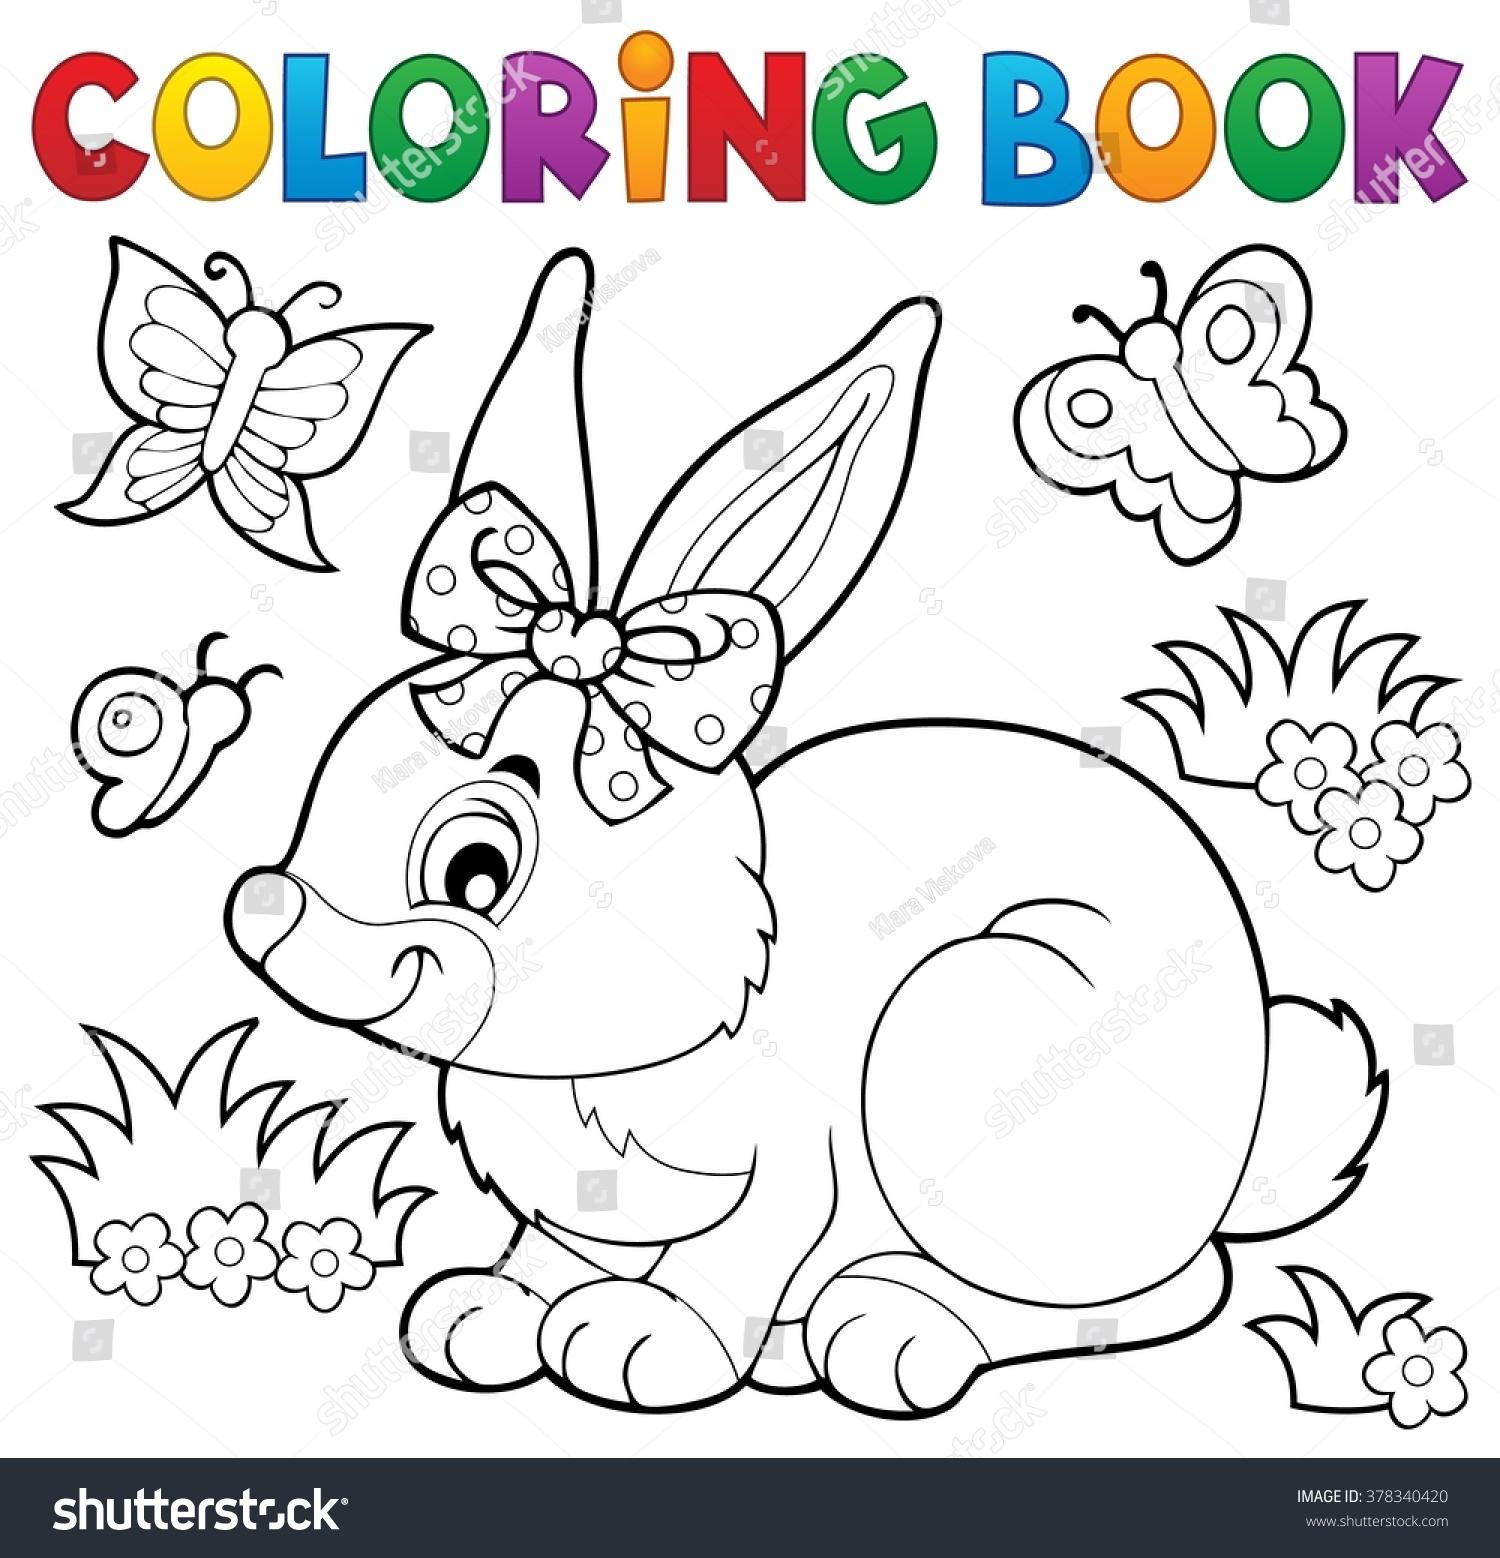 Coloring Book Rabbit Topic 3